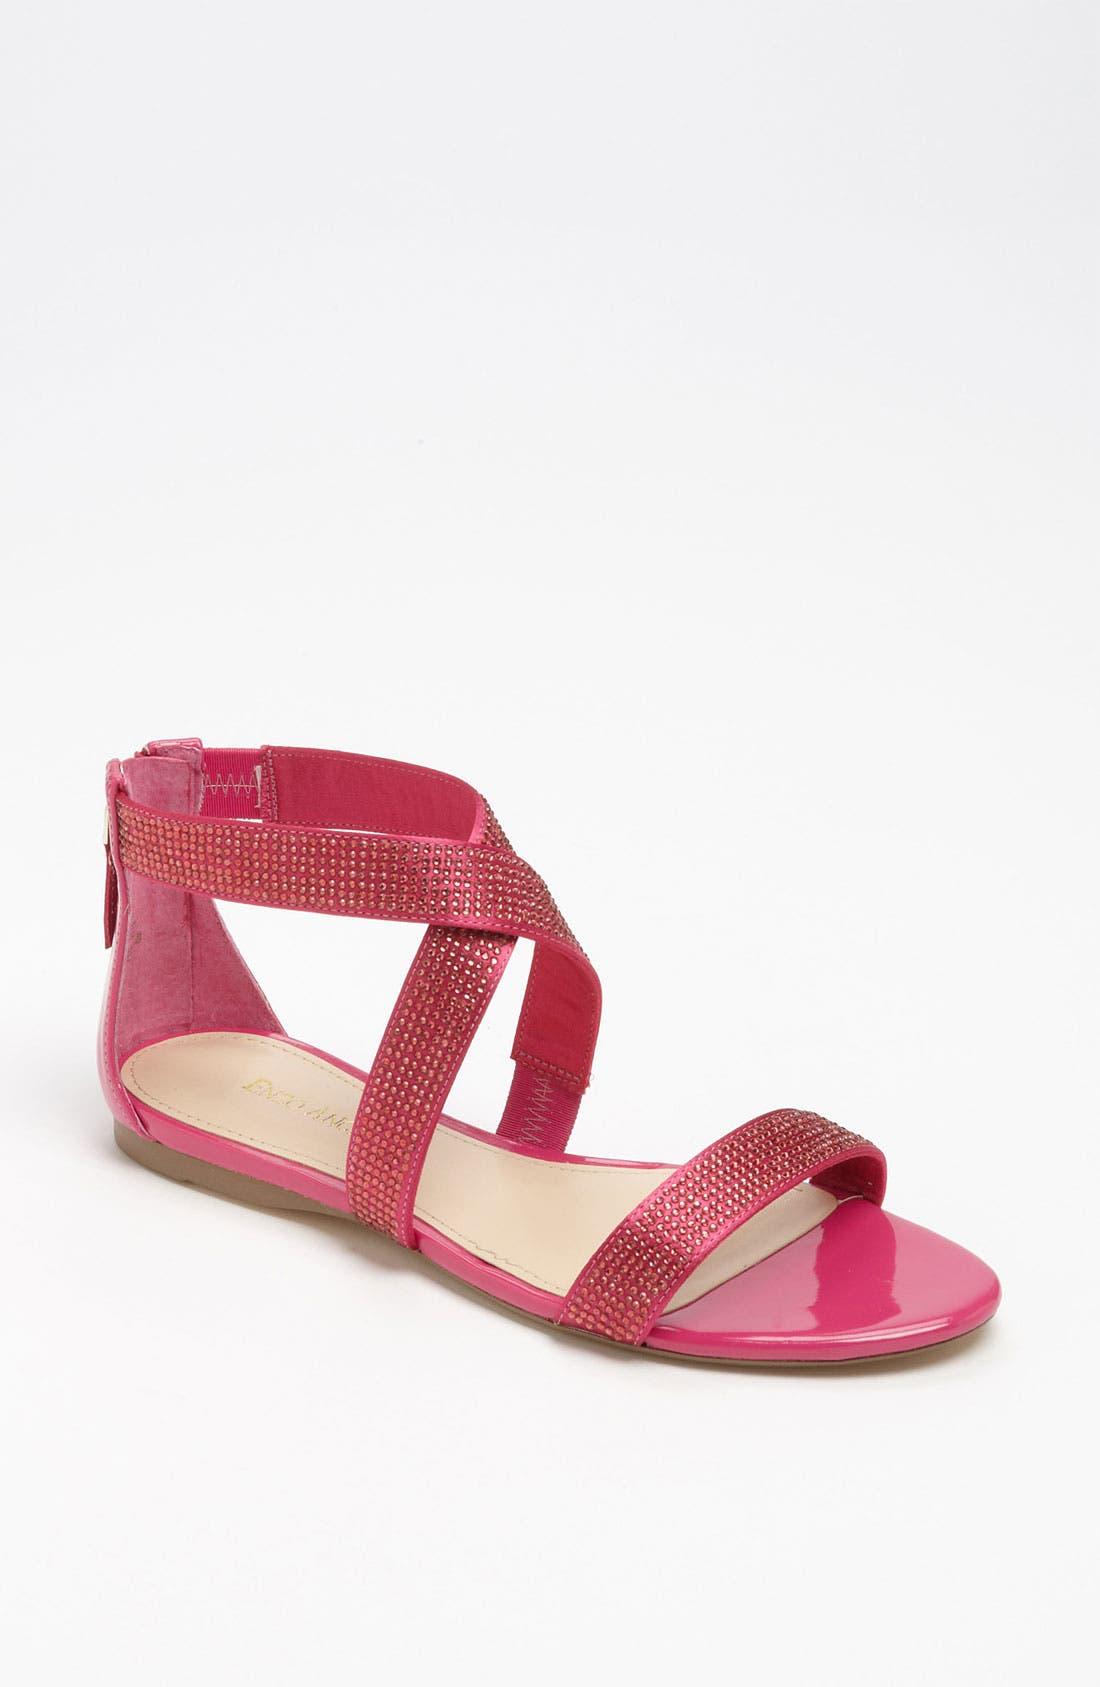 Main Image - Enzo Angiolini 'Peytin' Sandal (Special Purchase)